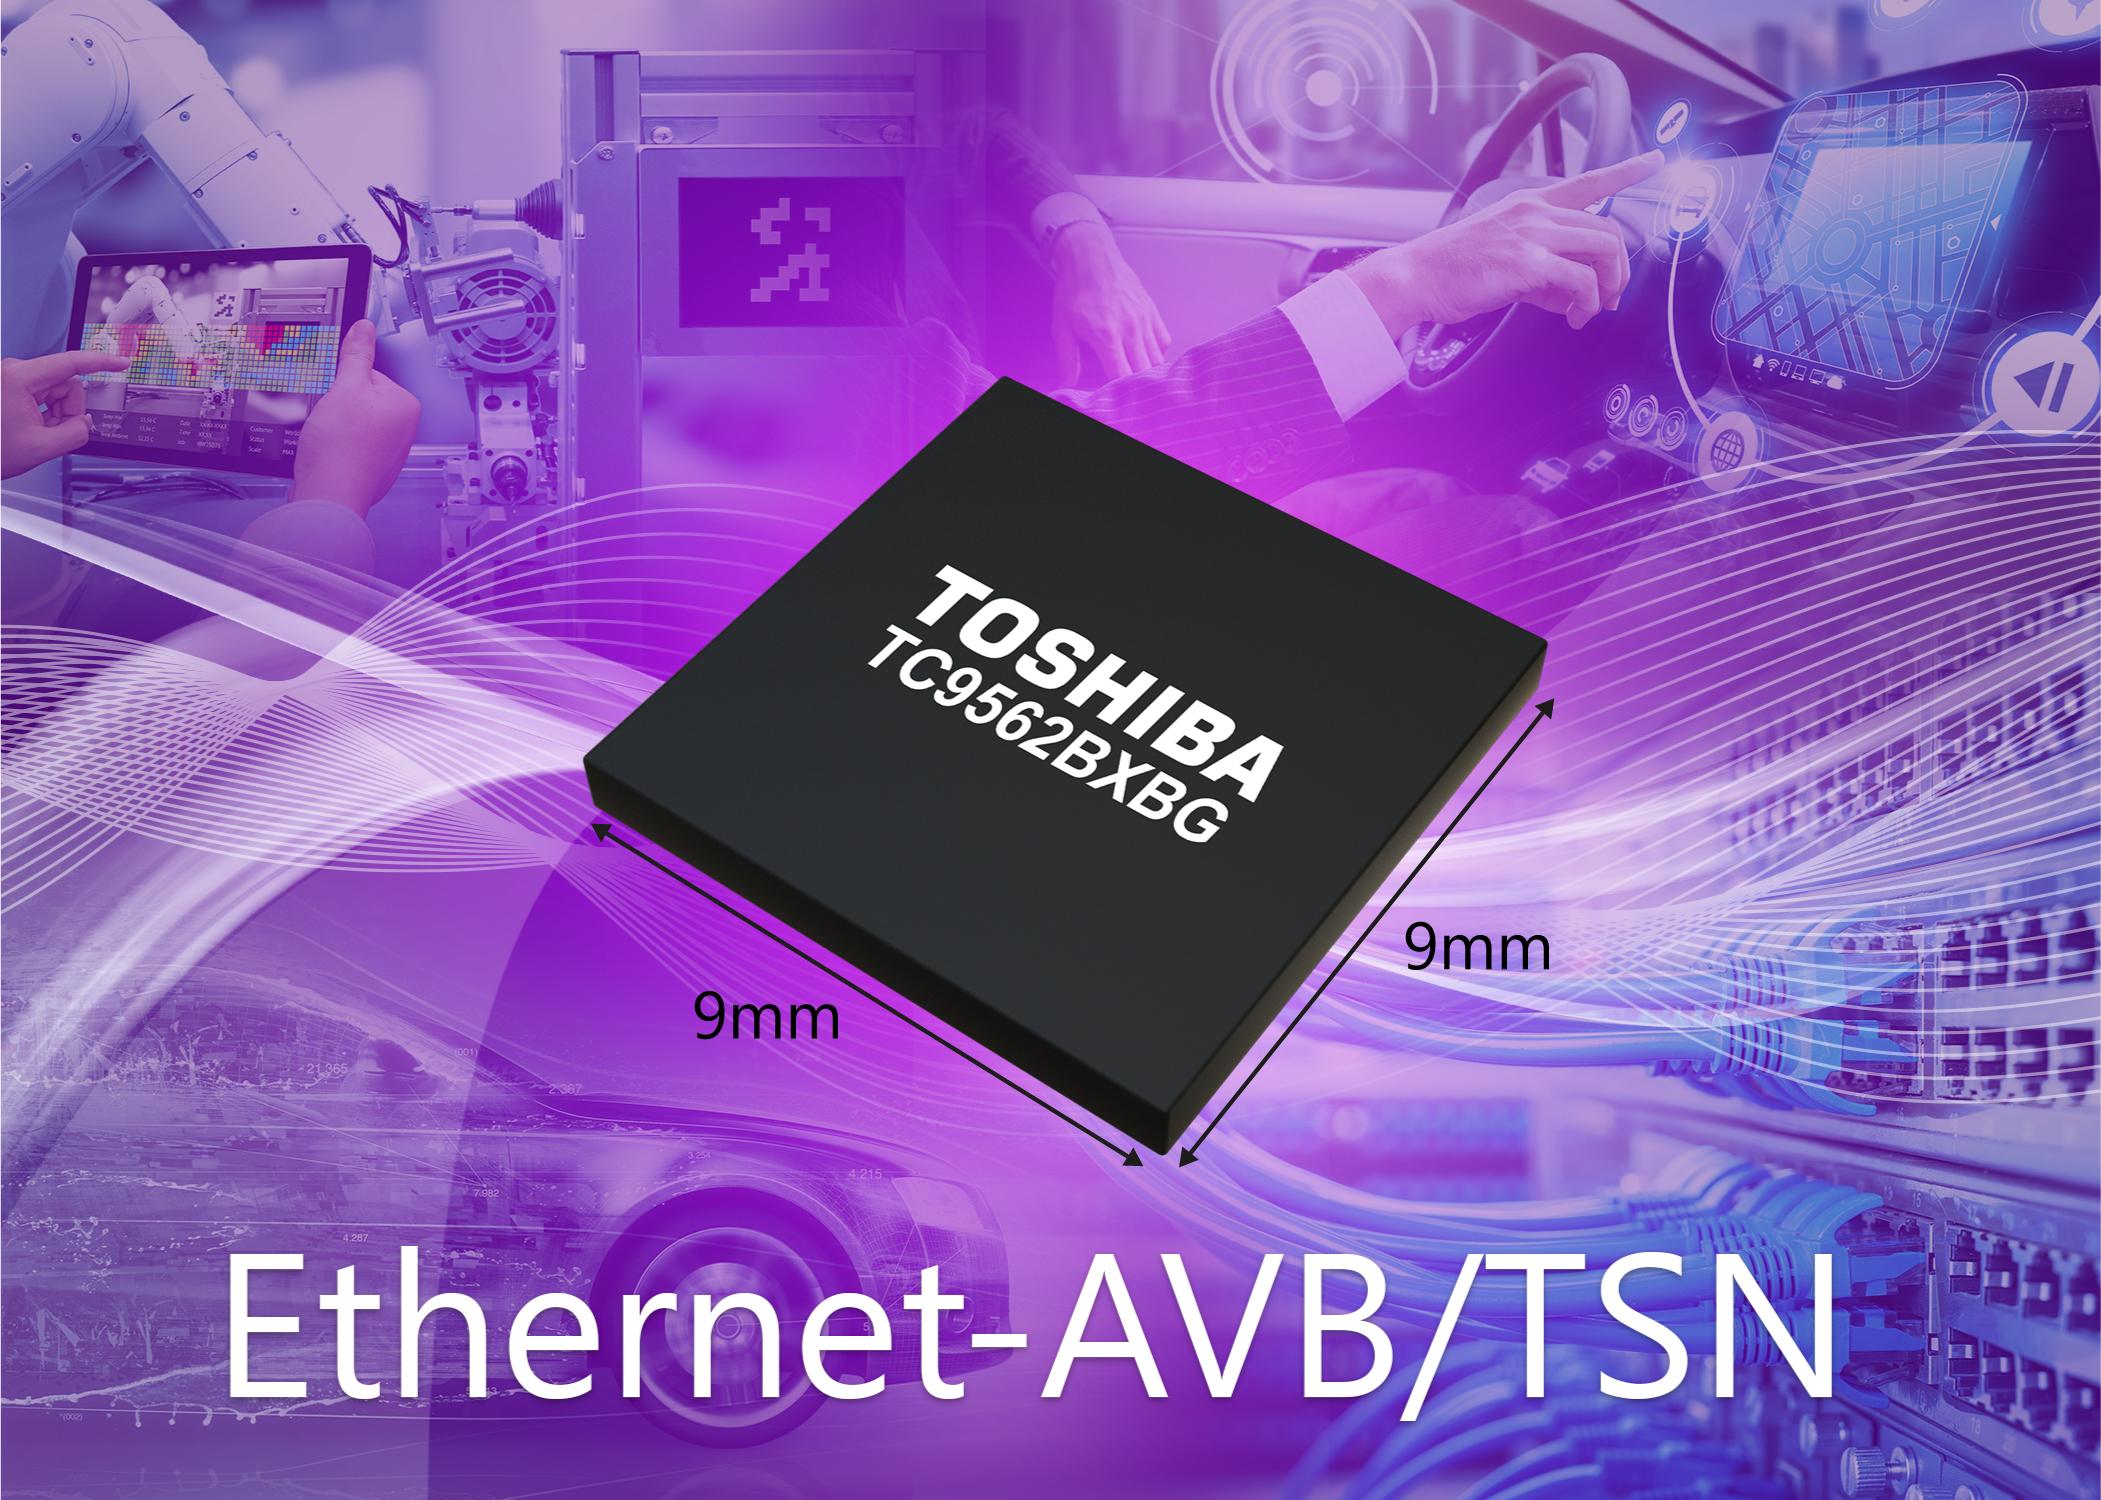 Toshiba_TC9562BXBG.jpg